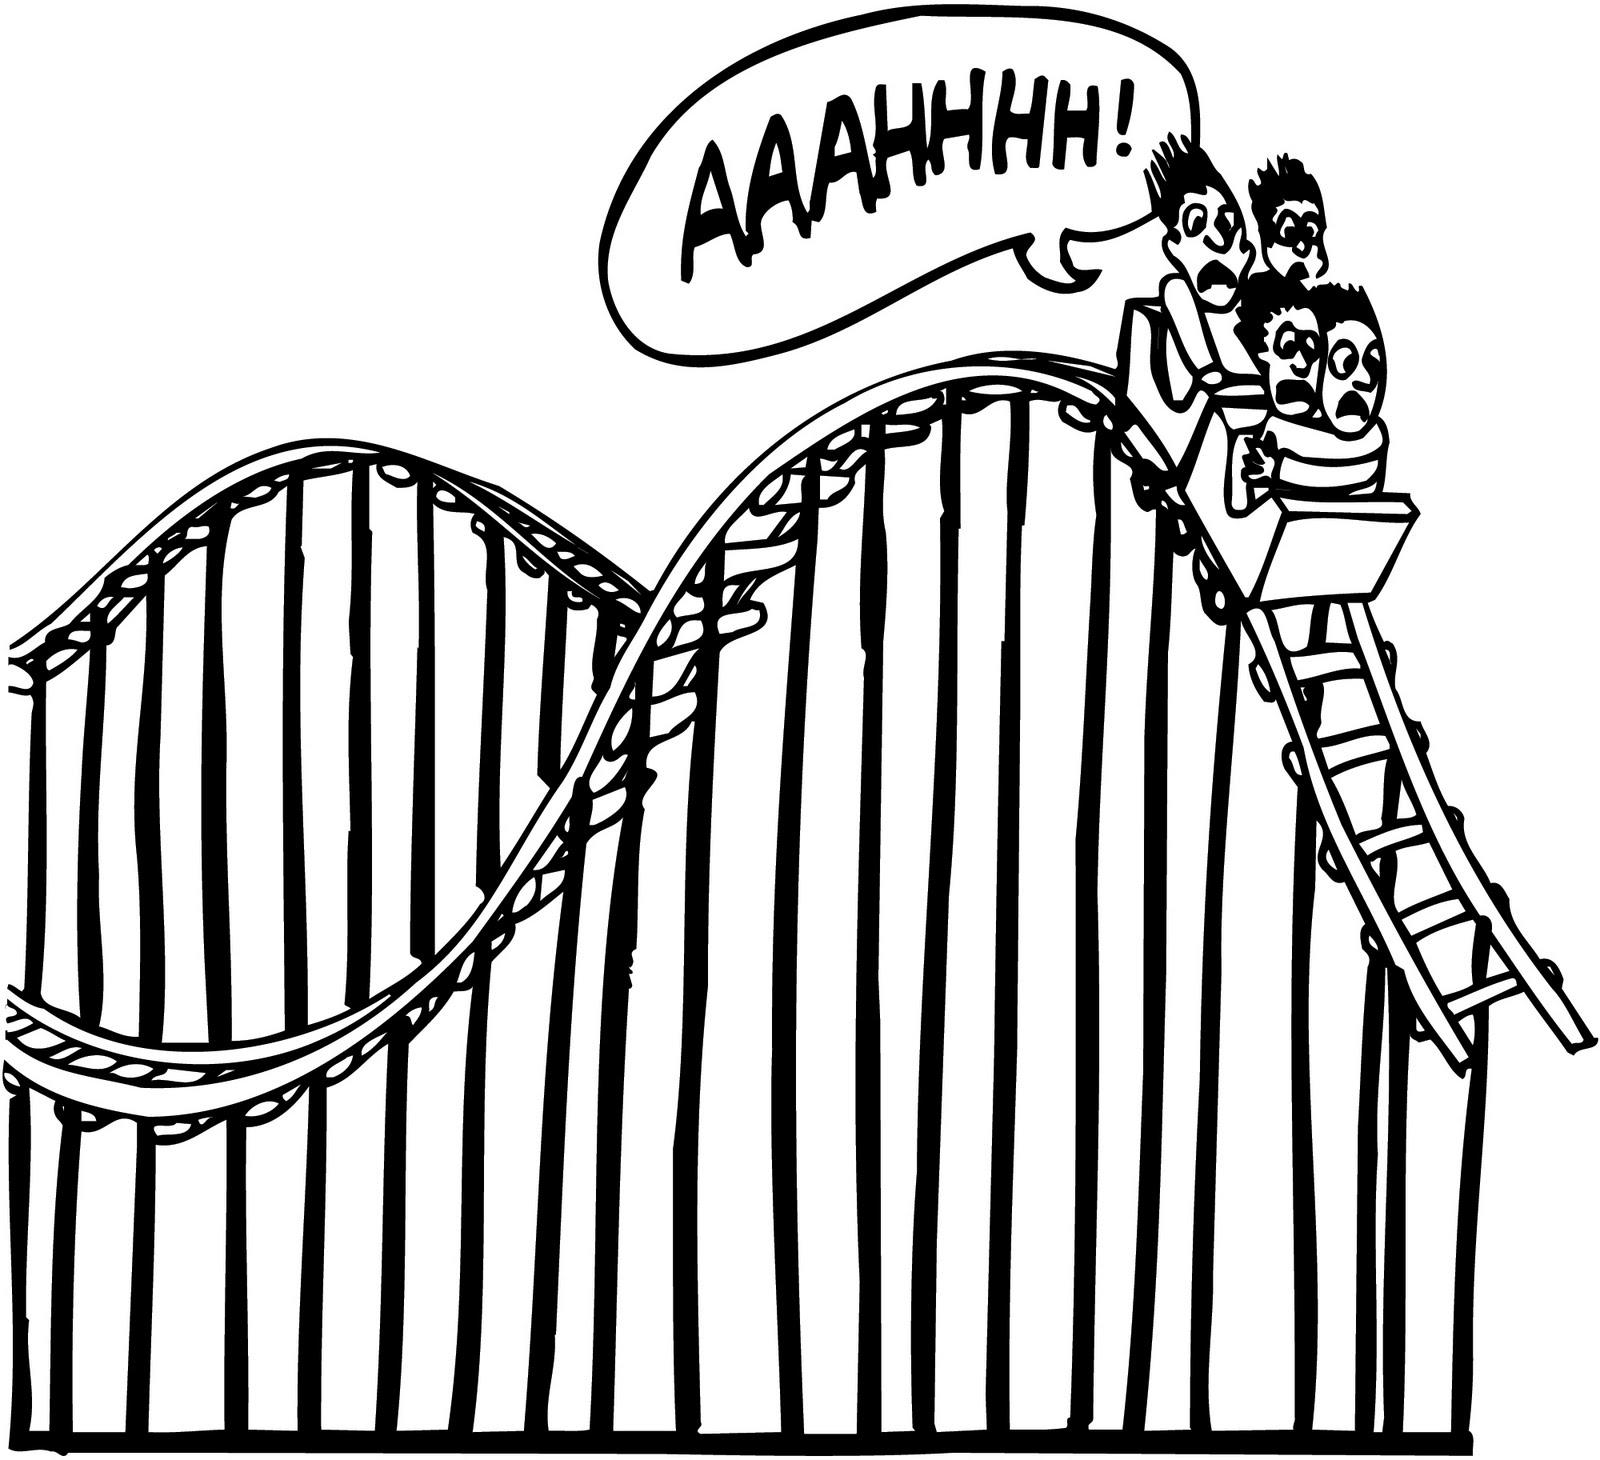 Simple Roller Coaster Drawing At Getdrawings